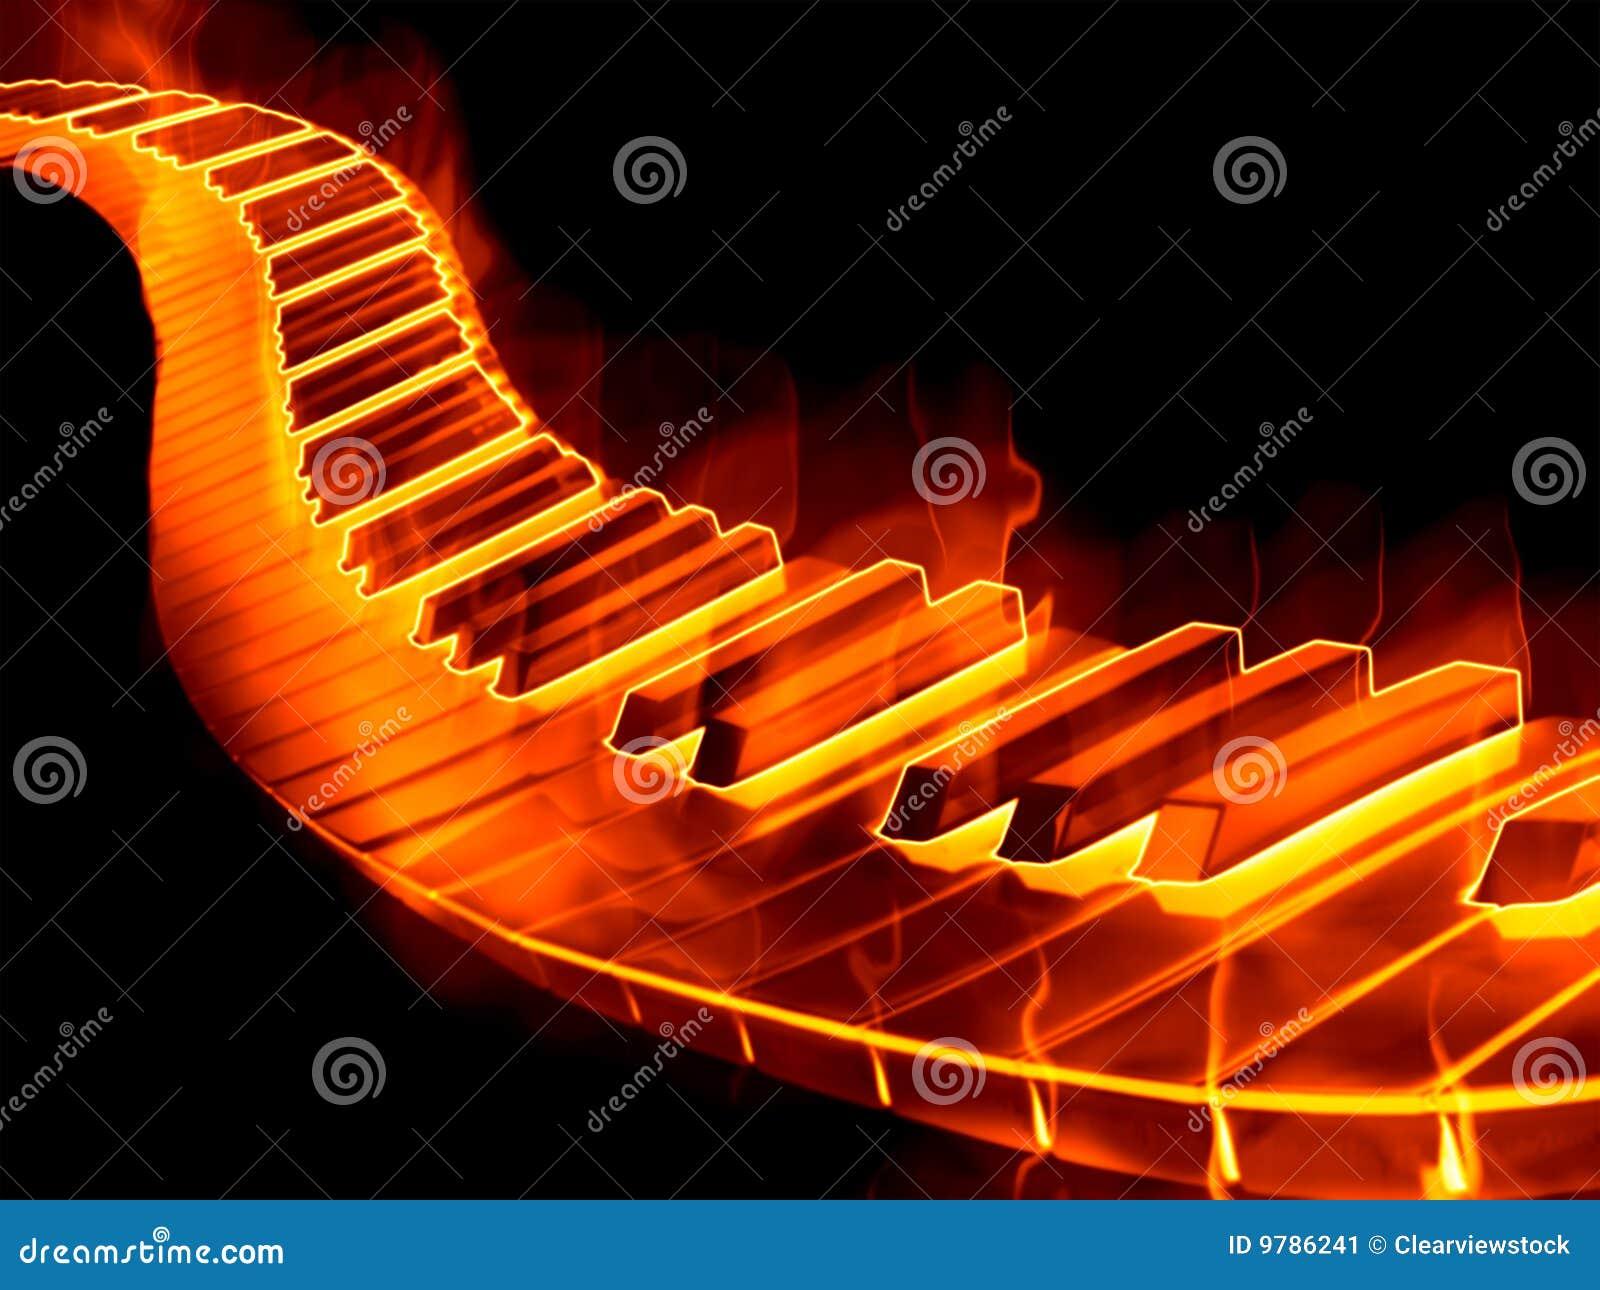 keyboard on fire stock image